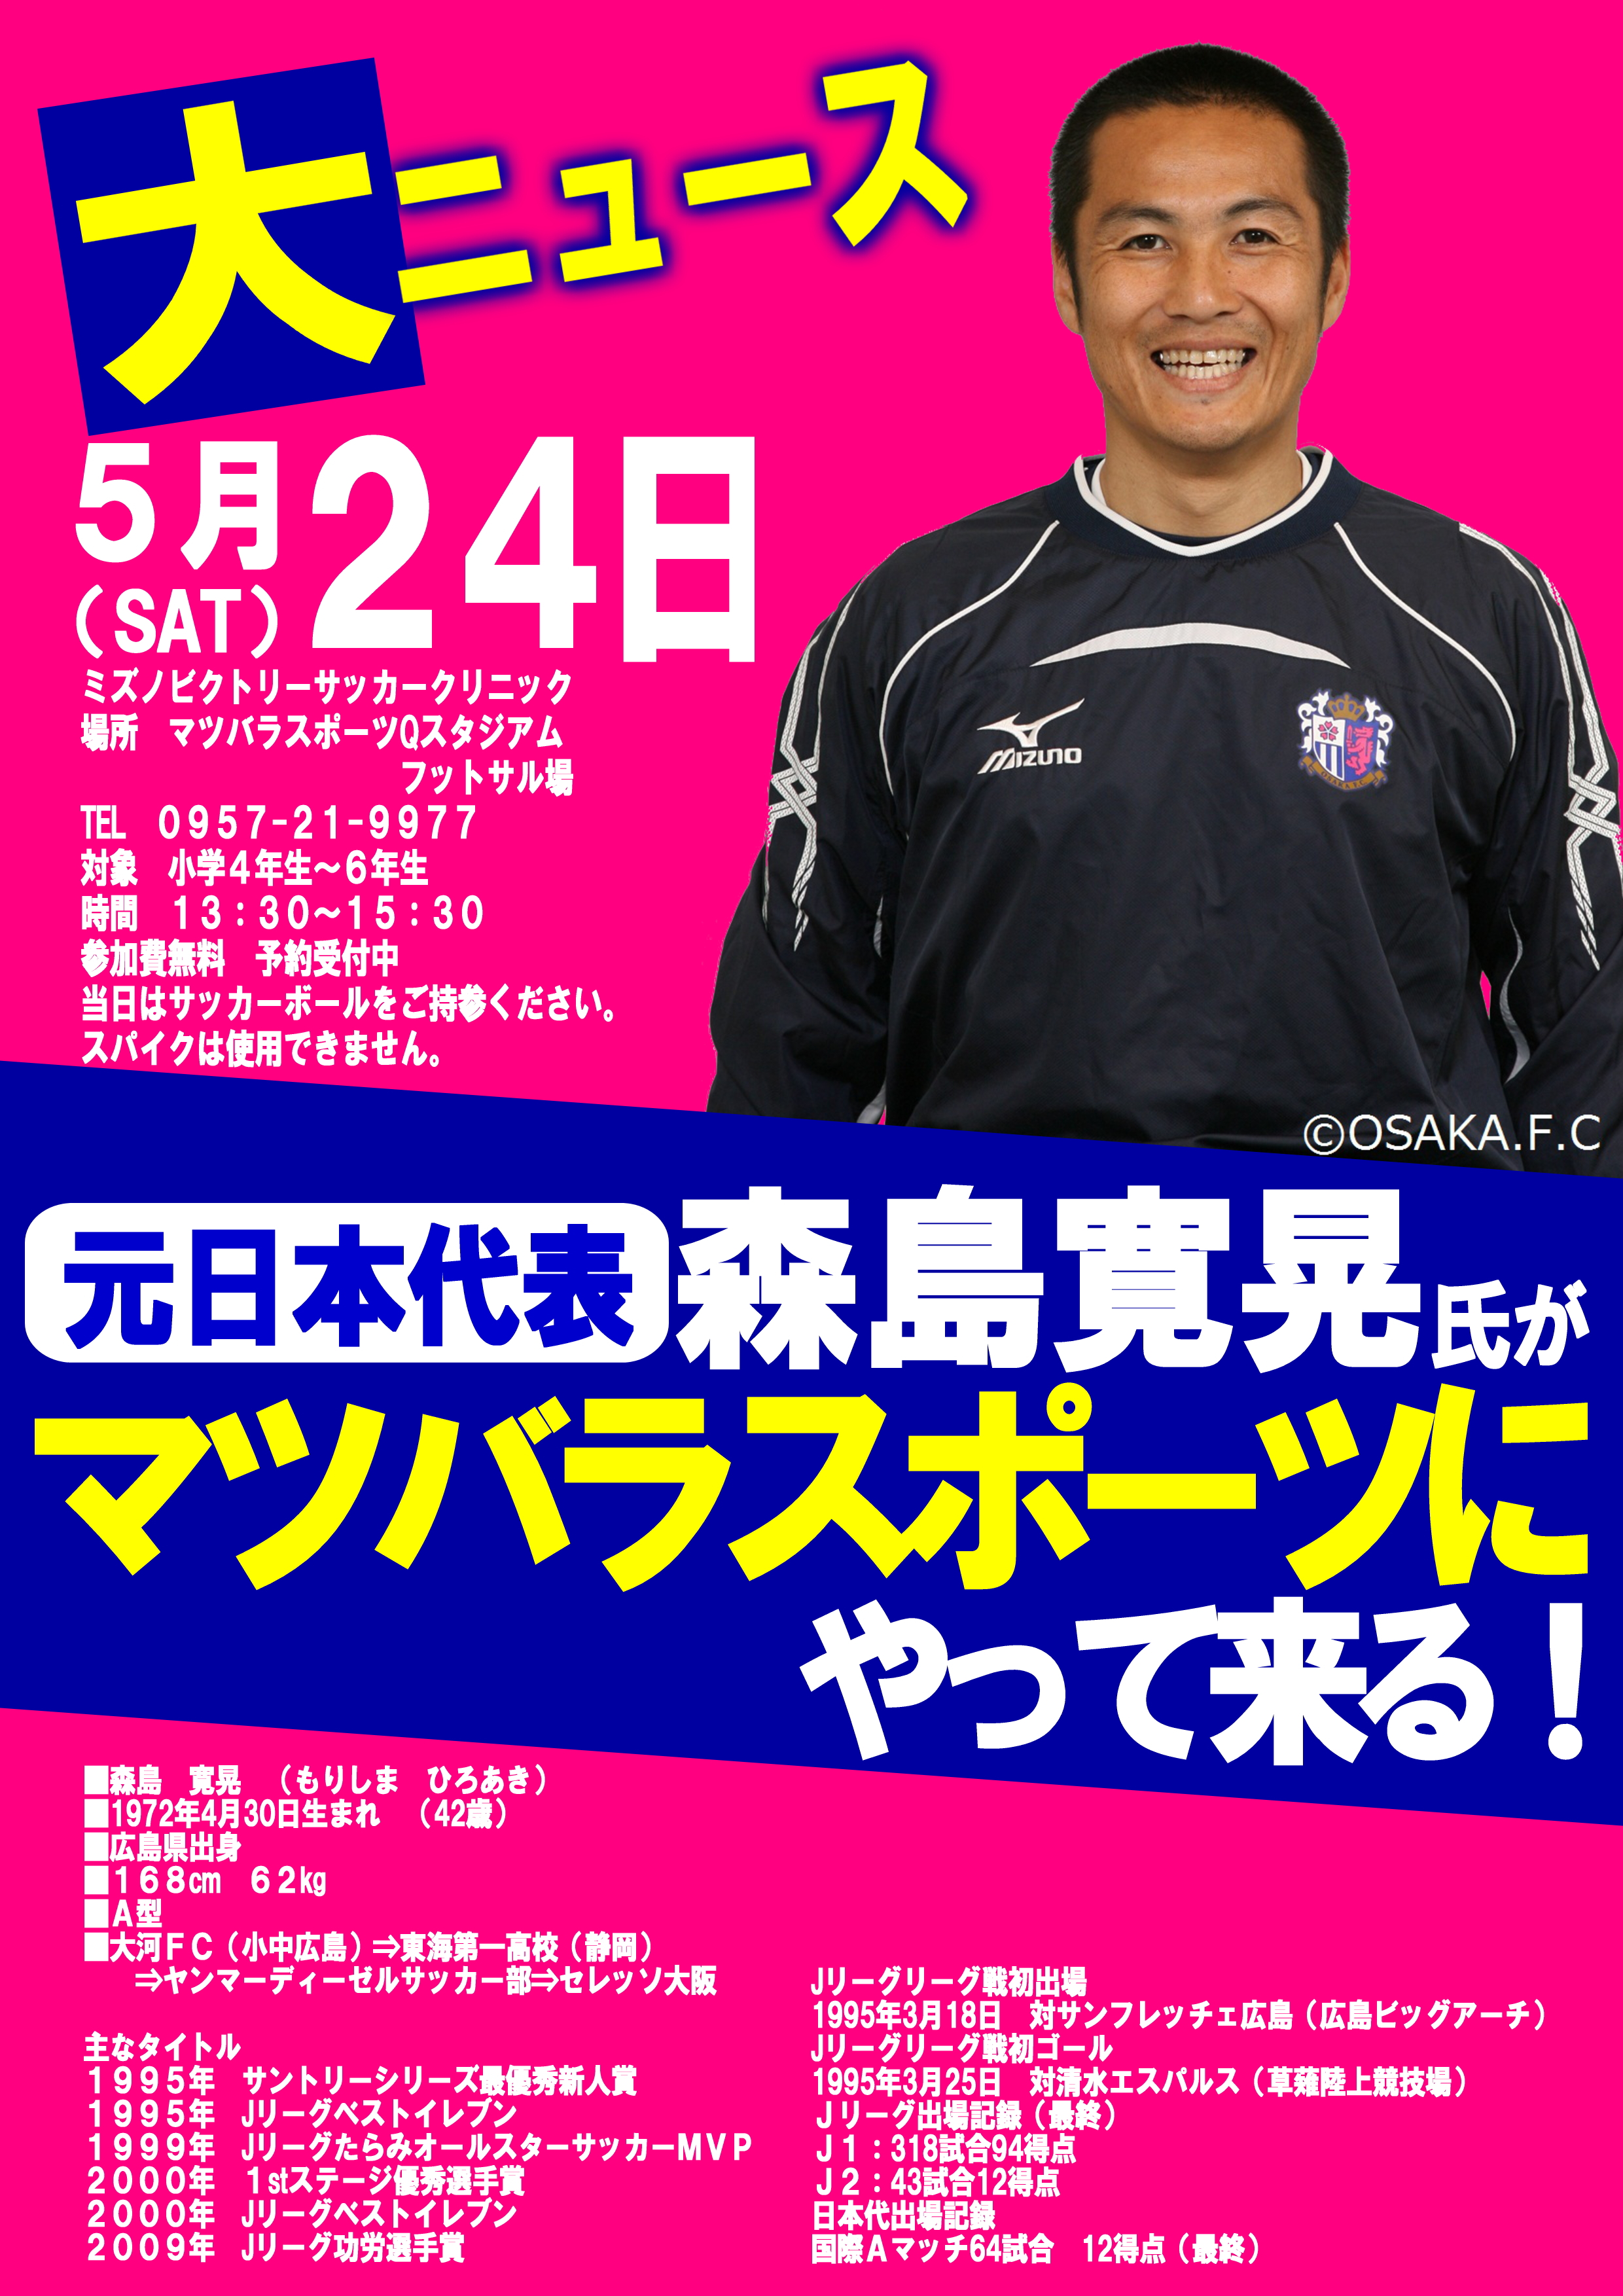 クレ森島寛晃氏完成2-2